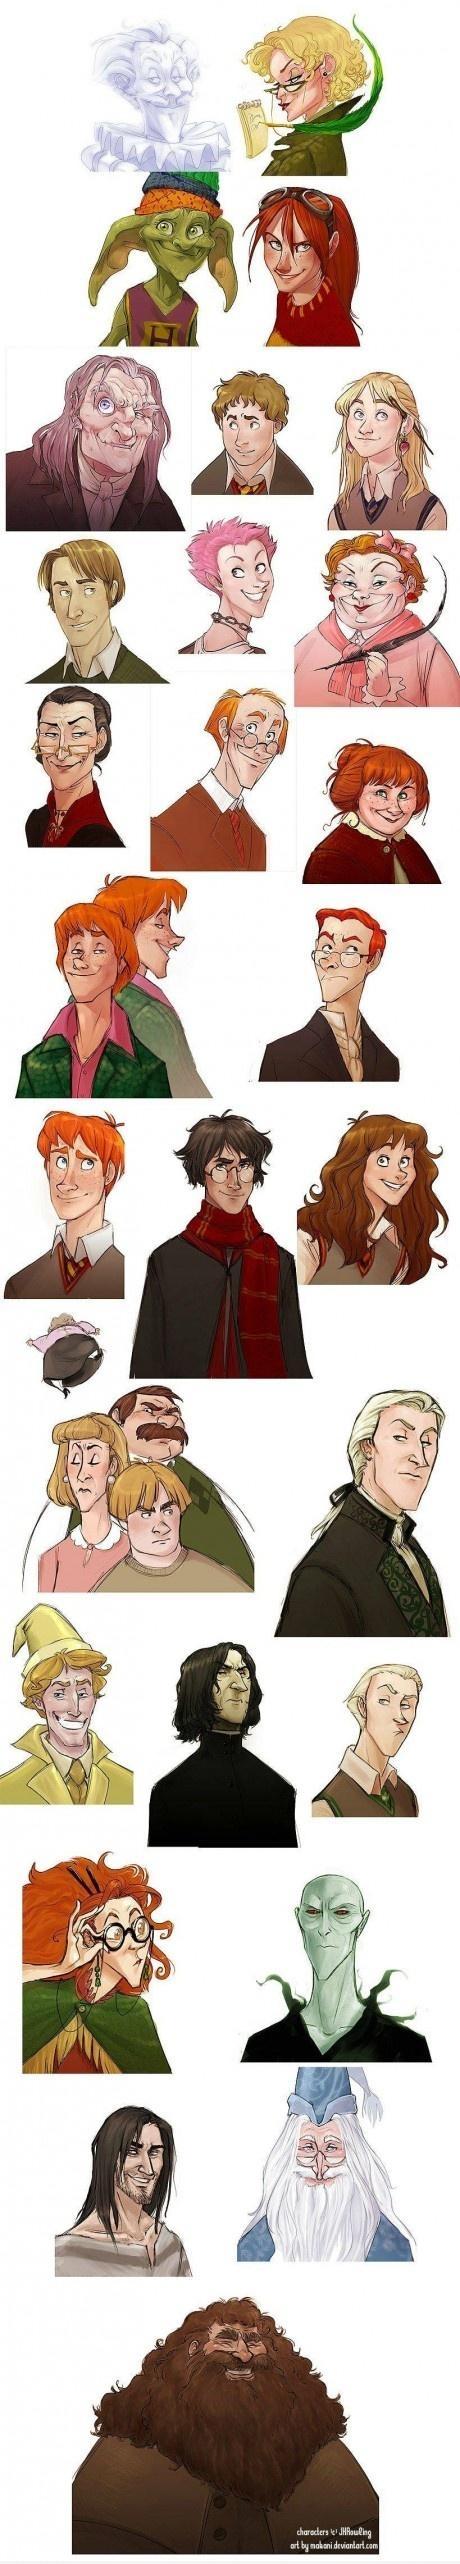 Disney Harry Potter